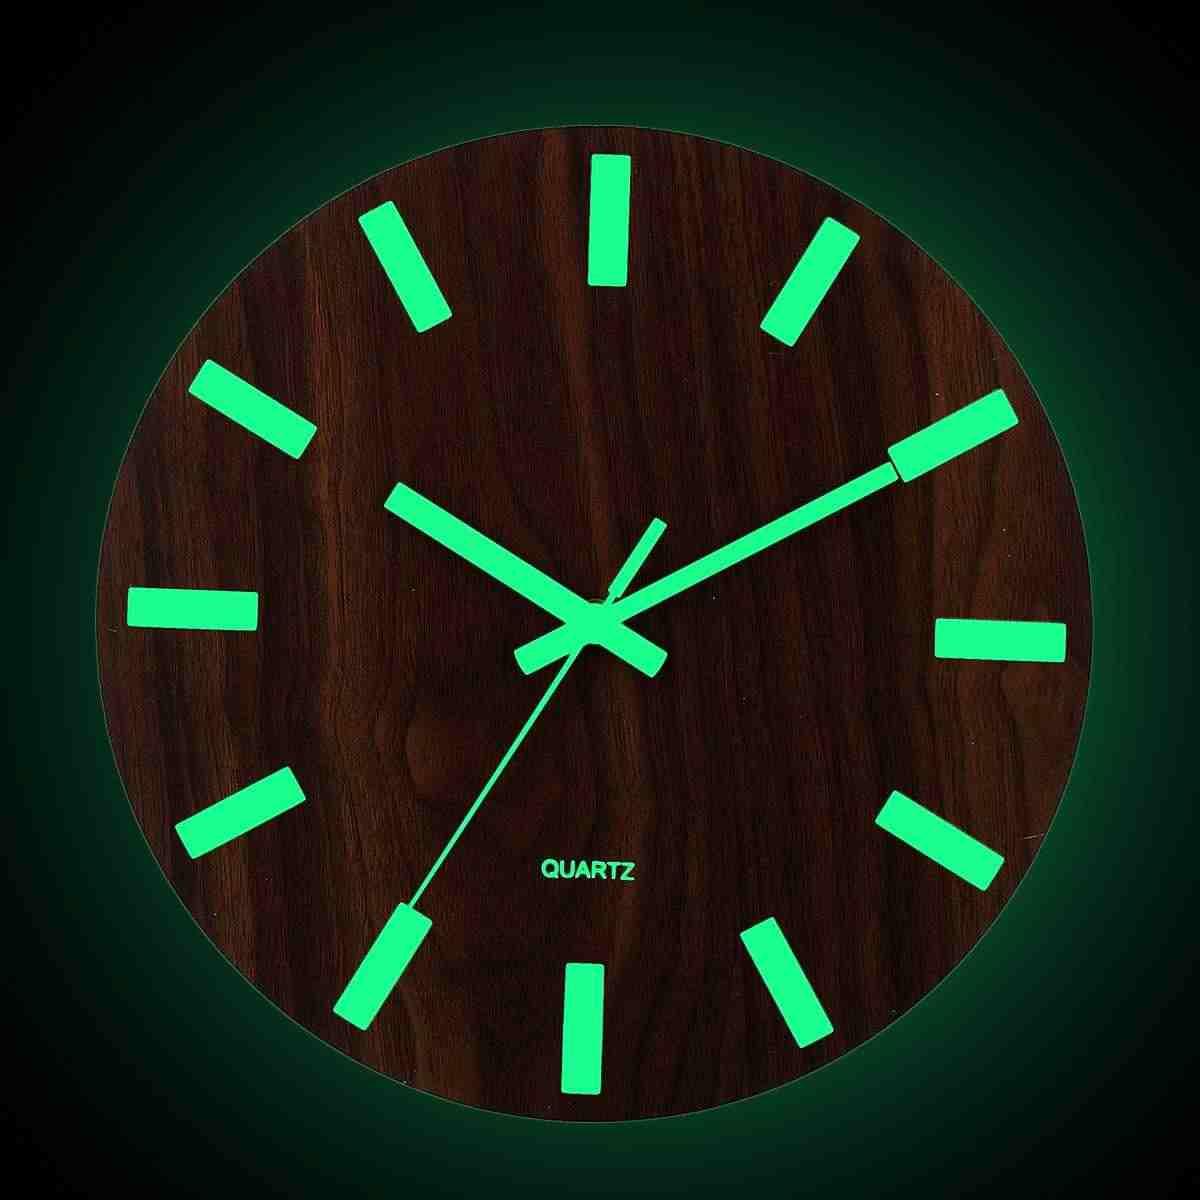 12 Inch Luminous Wall Clock Silent Glow In Dark Decorative For Home Living Room Quartz Antique Hanging Clock Office Decor Wooden Wall Clocks Aliexpress